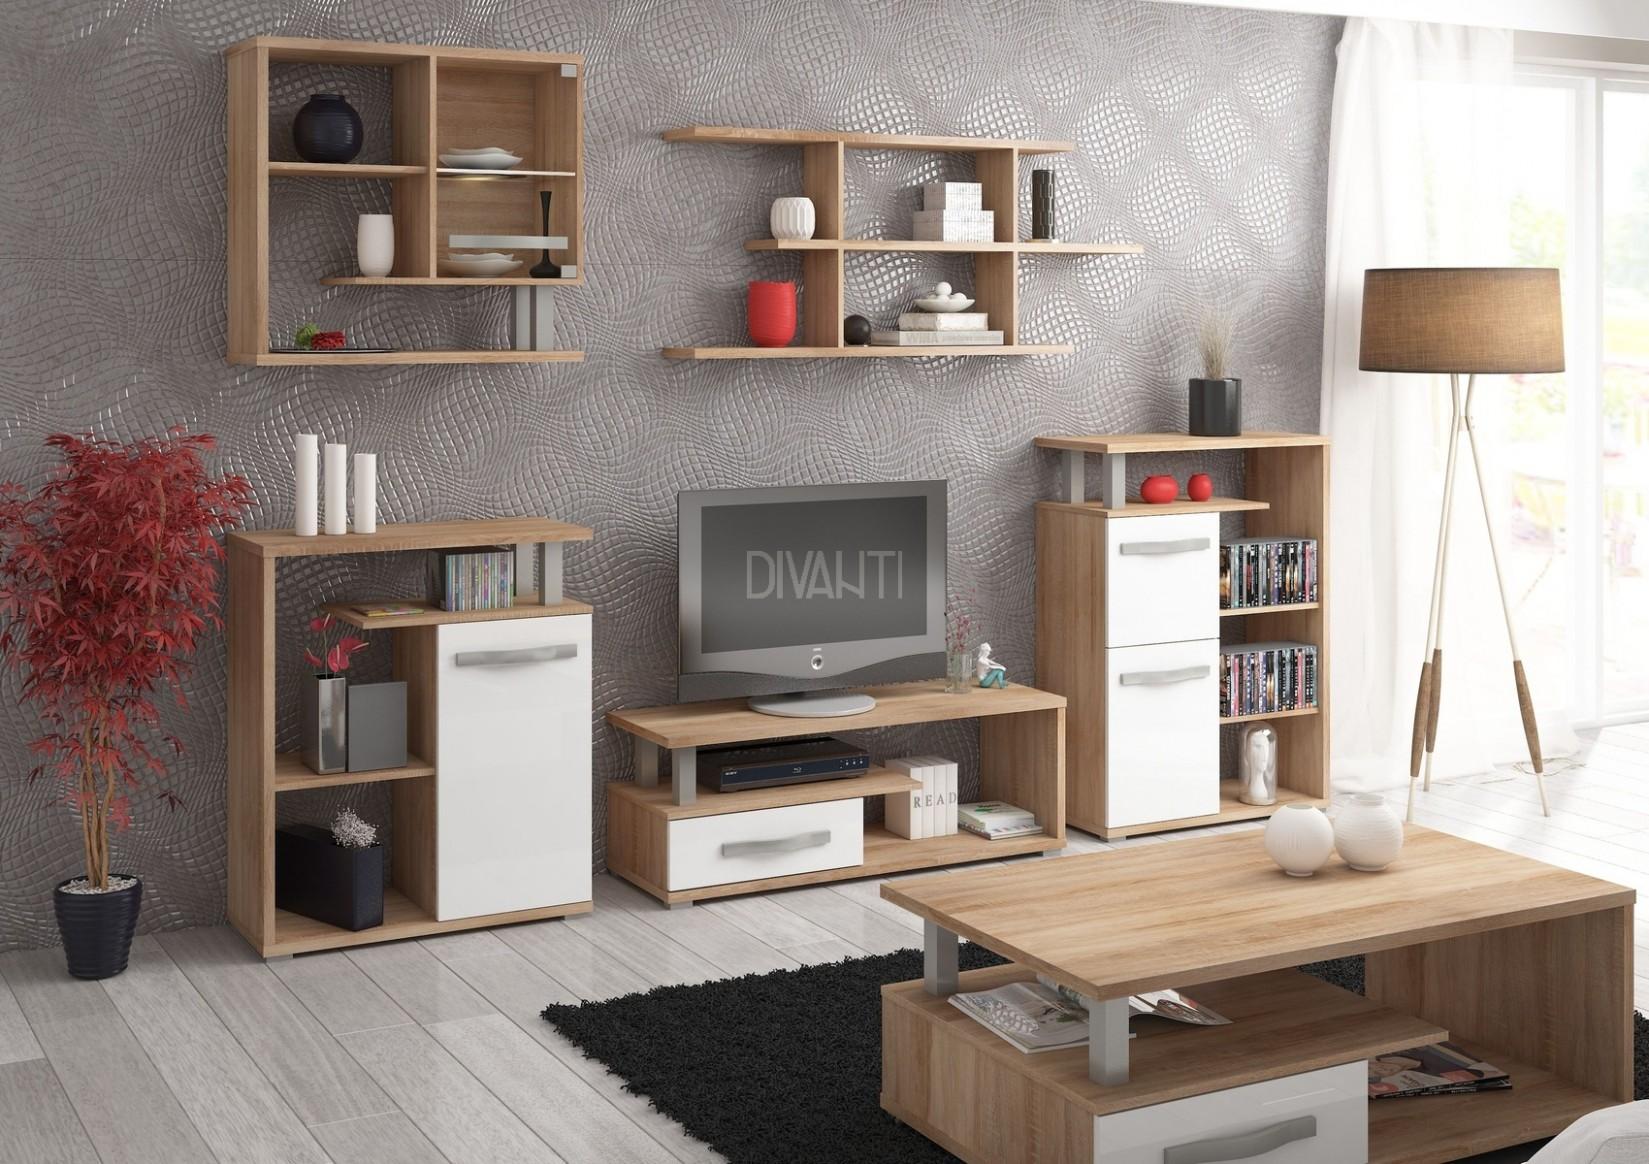 Systémový nábytek Angel Meblocross eshop Moravia Flat s.r.o.